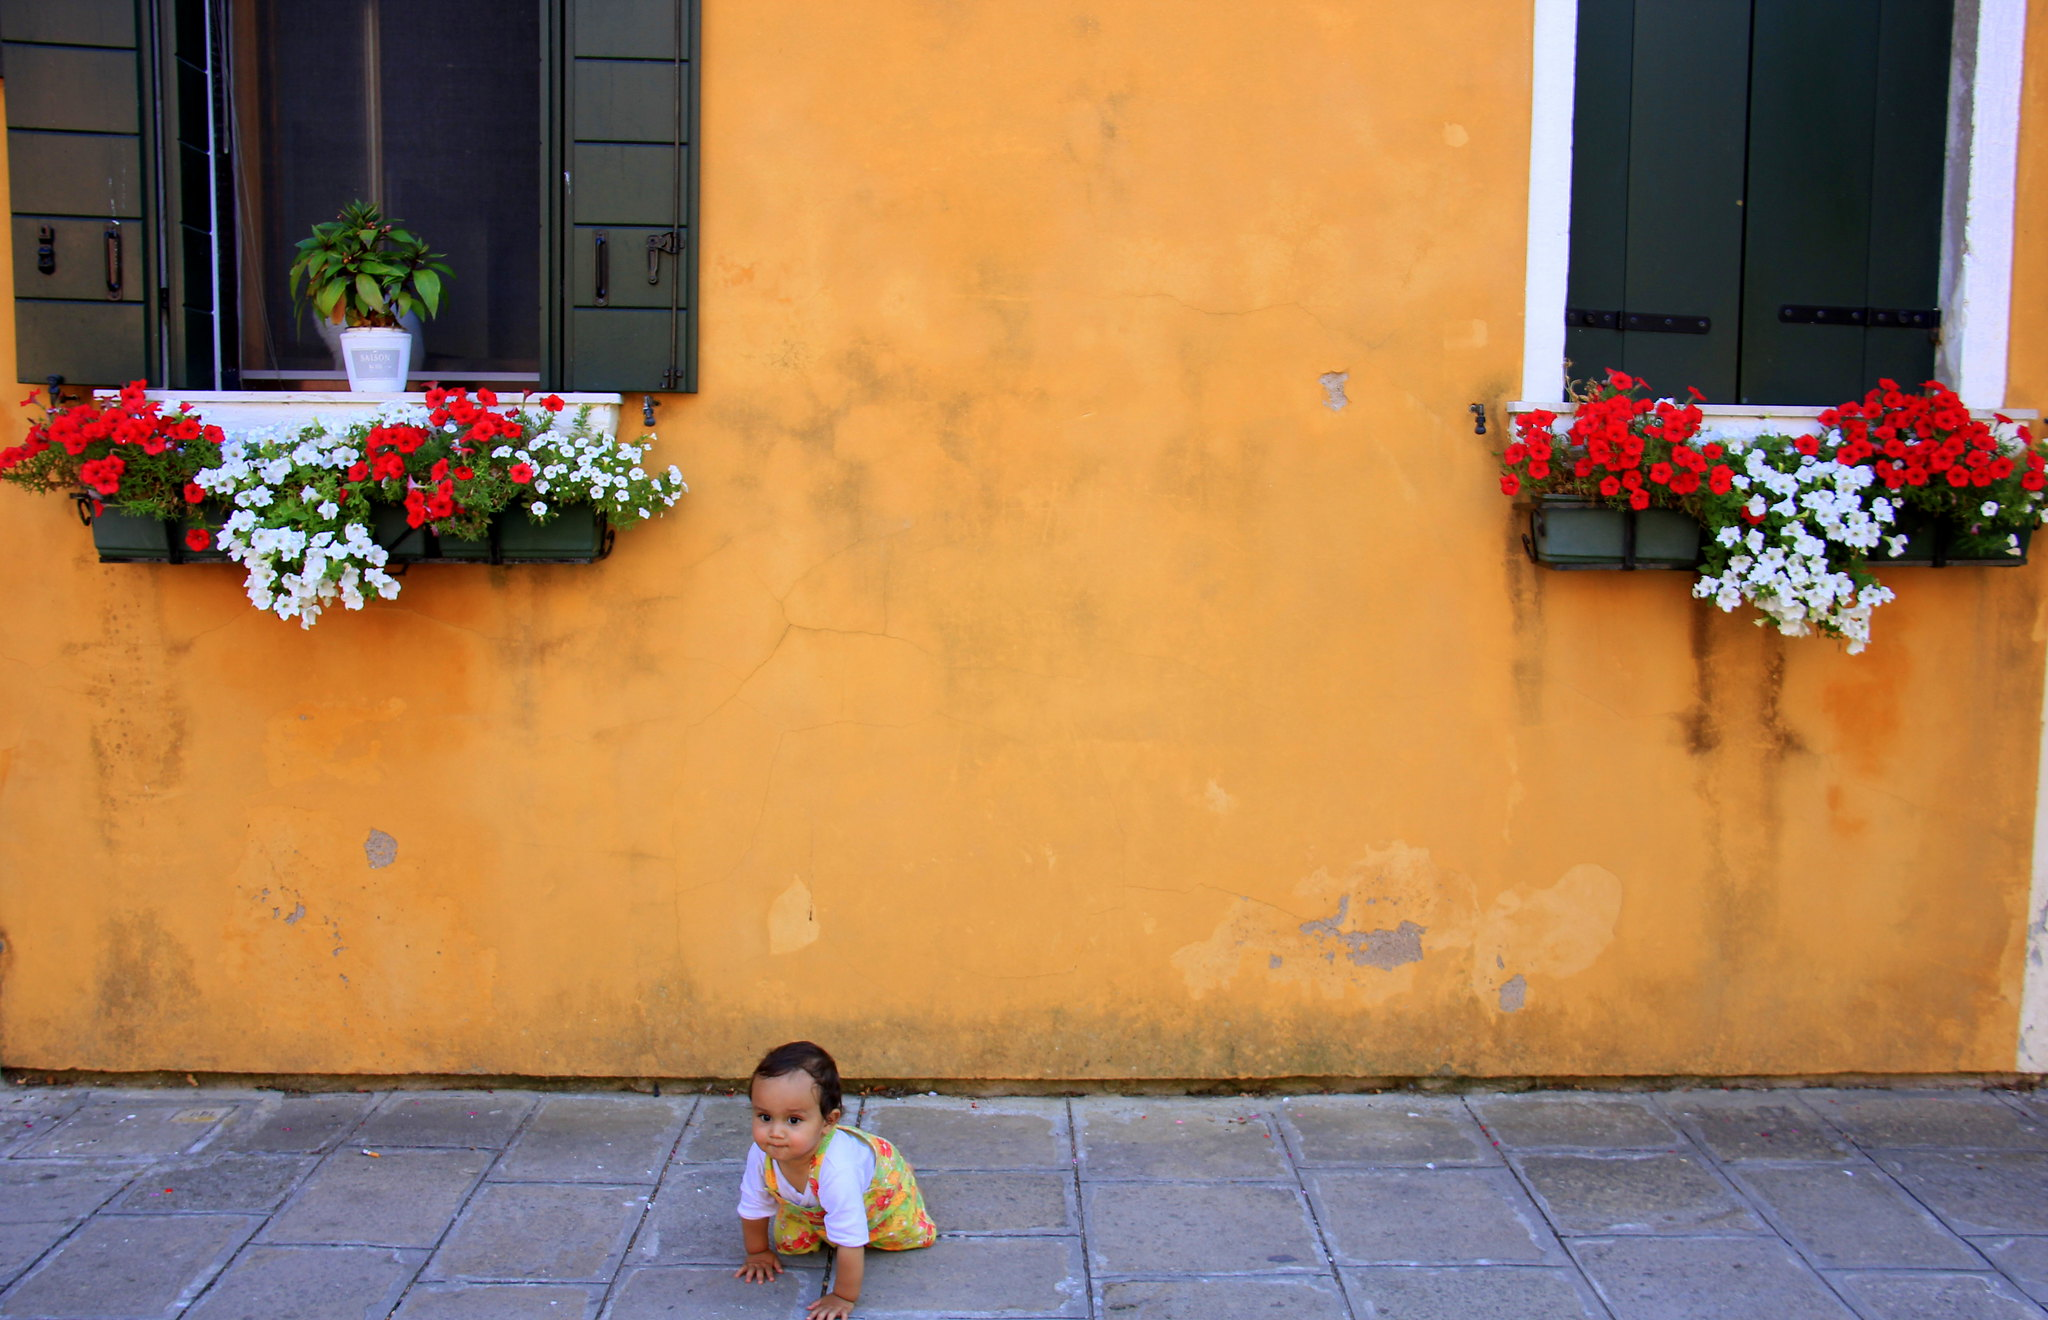 Explore Murano in the Venetian lagoon